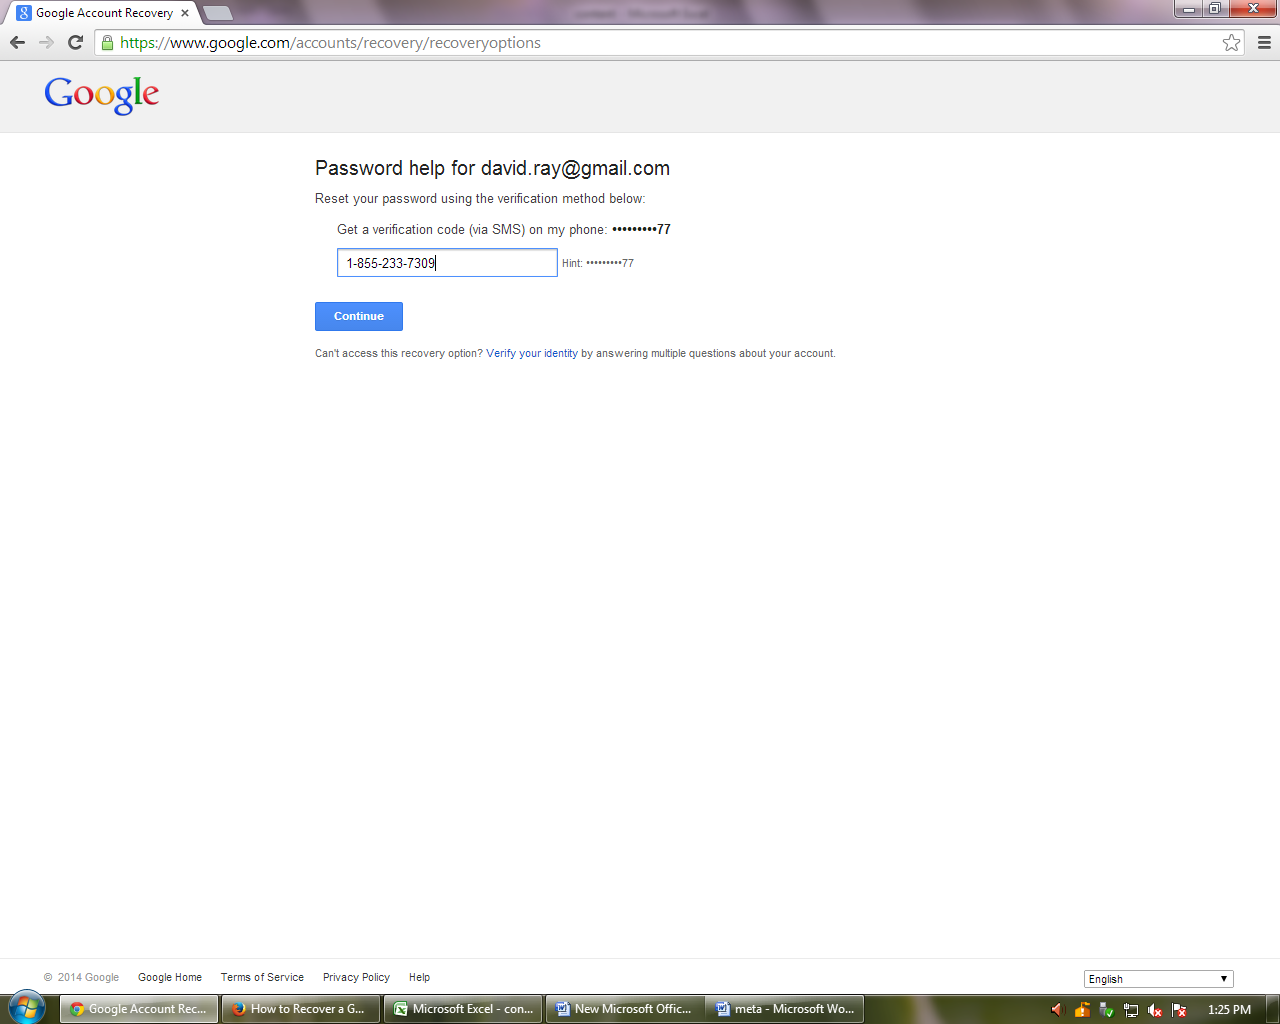 gmail password help